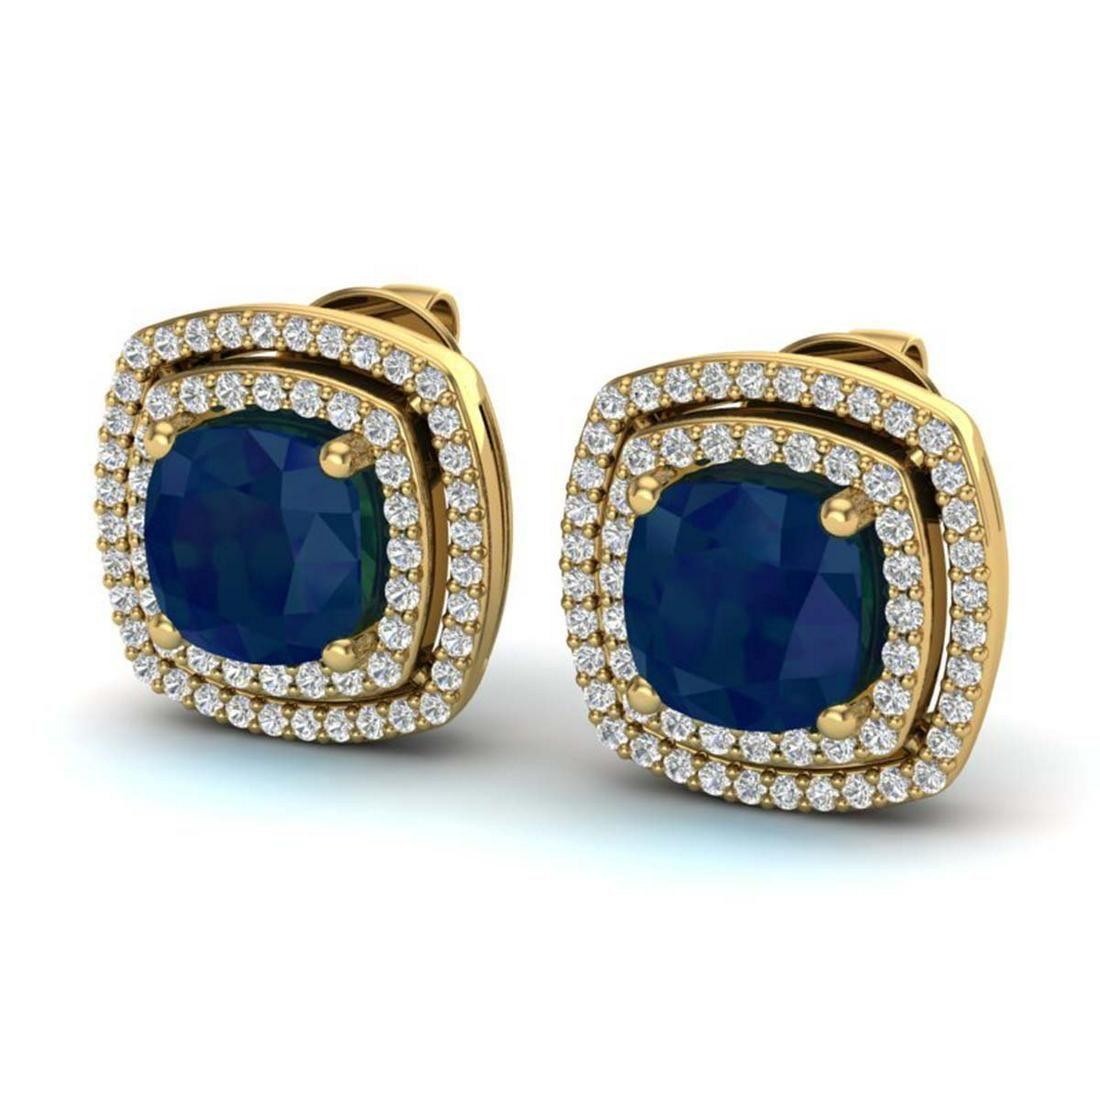 495 ctw Sapphire VSSI Diamond Earrings 18K Yellow